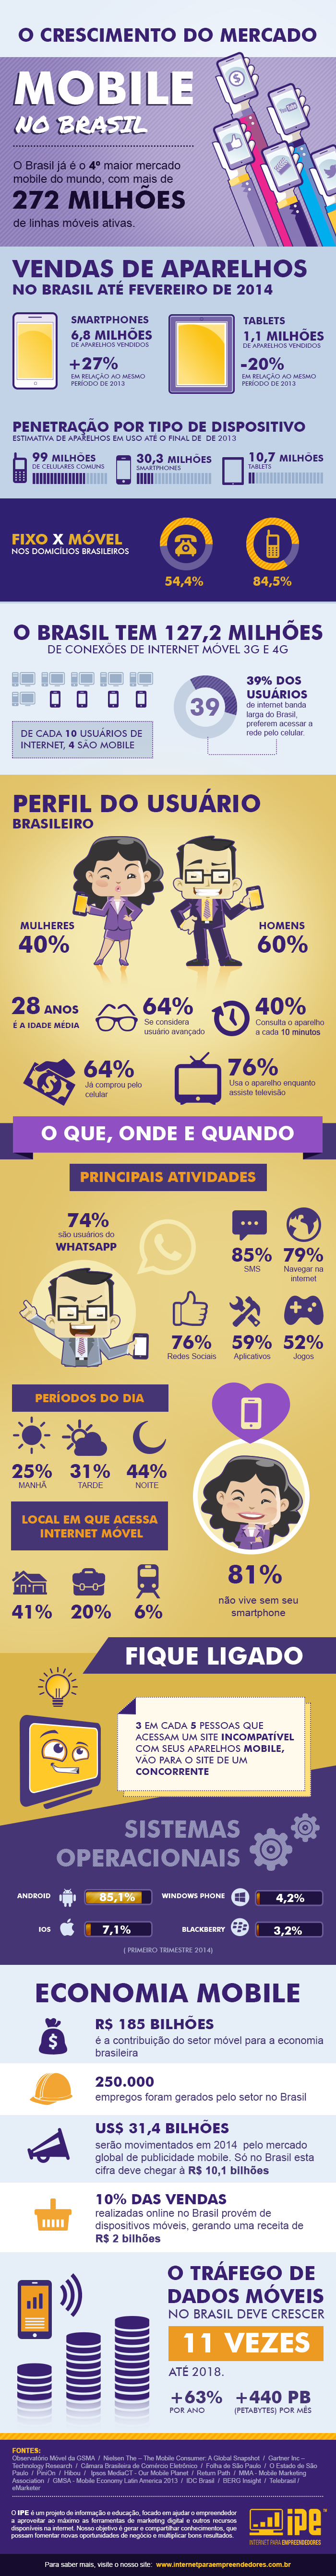 Infográfico do crescimento mobile no Brasil